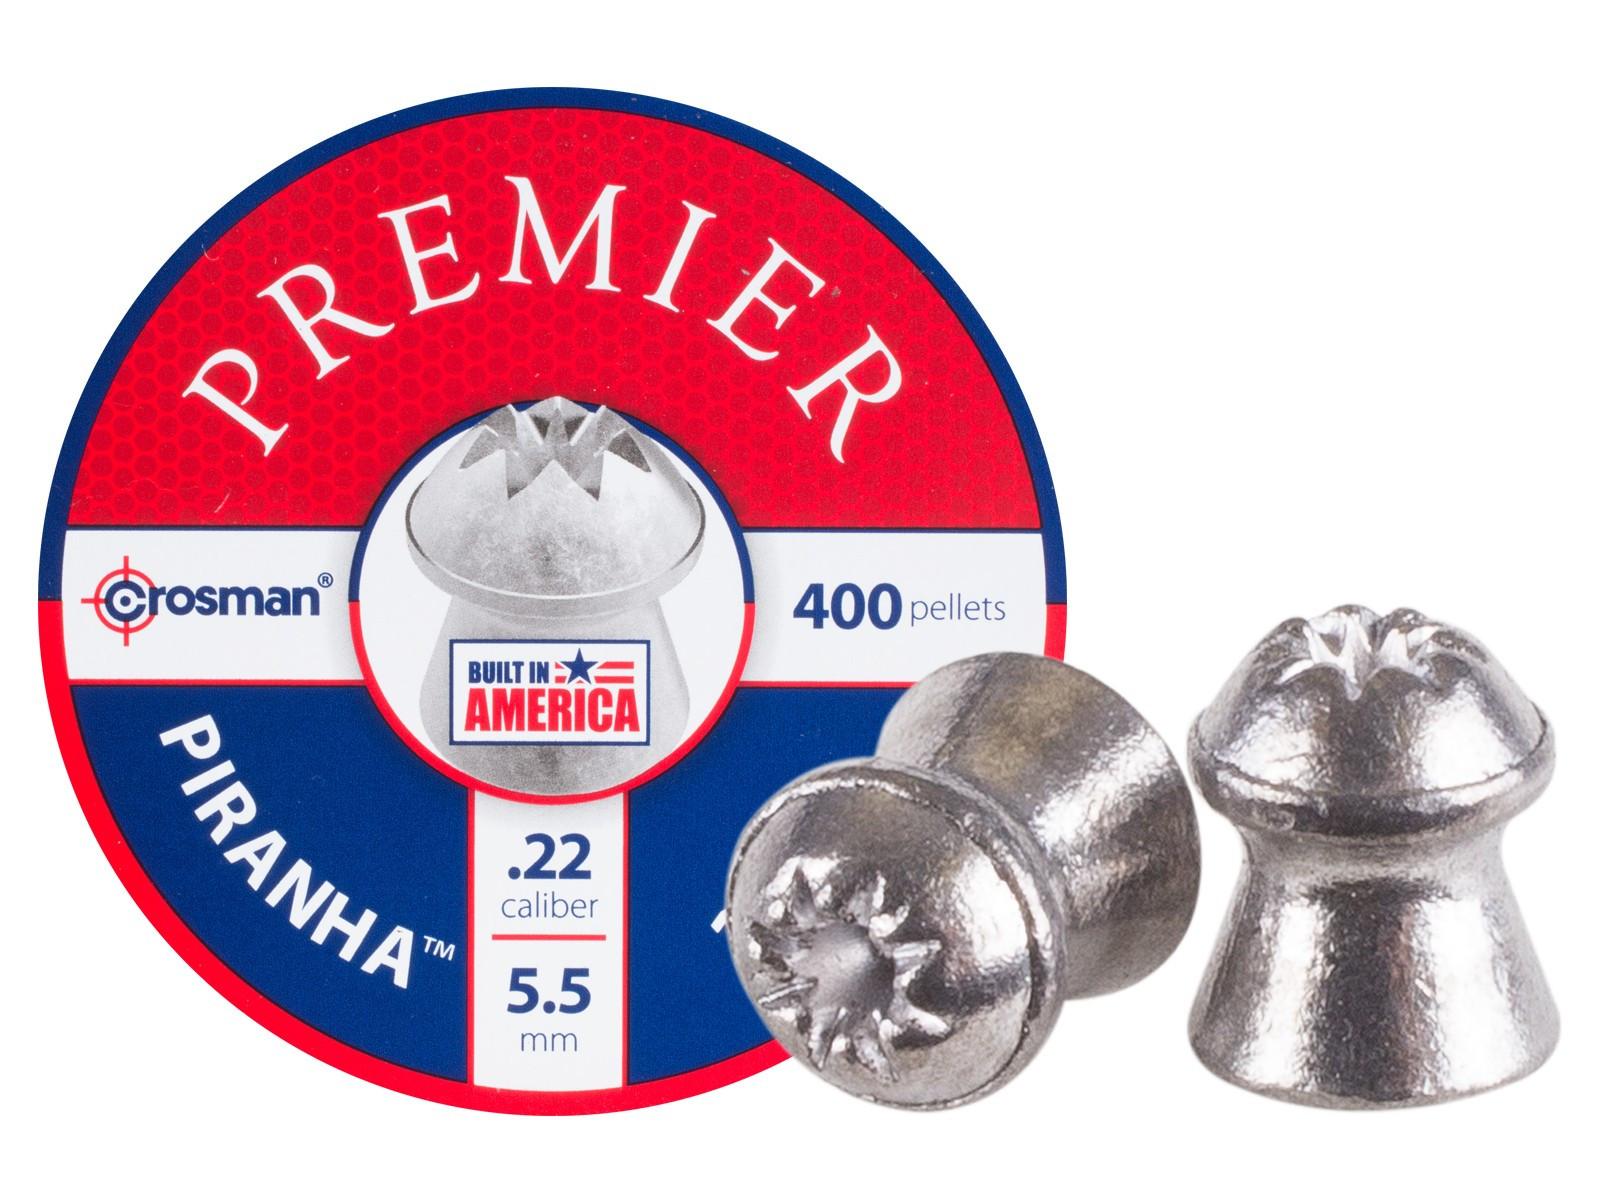 Crosman Premier Piranha .22 Cal, 14.3 gr - 400 ct